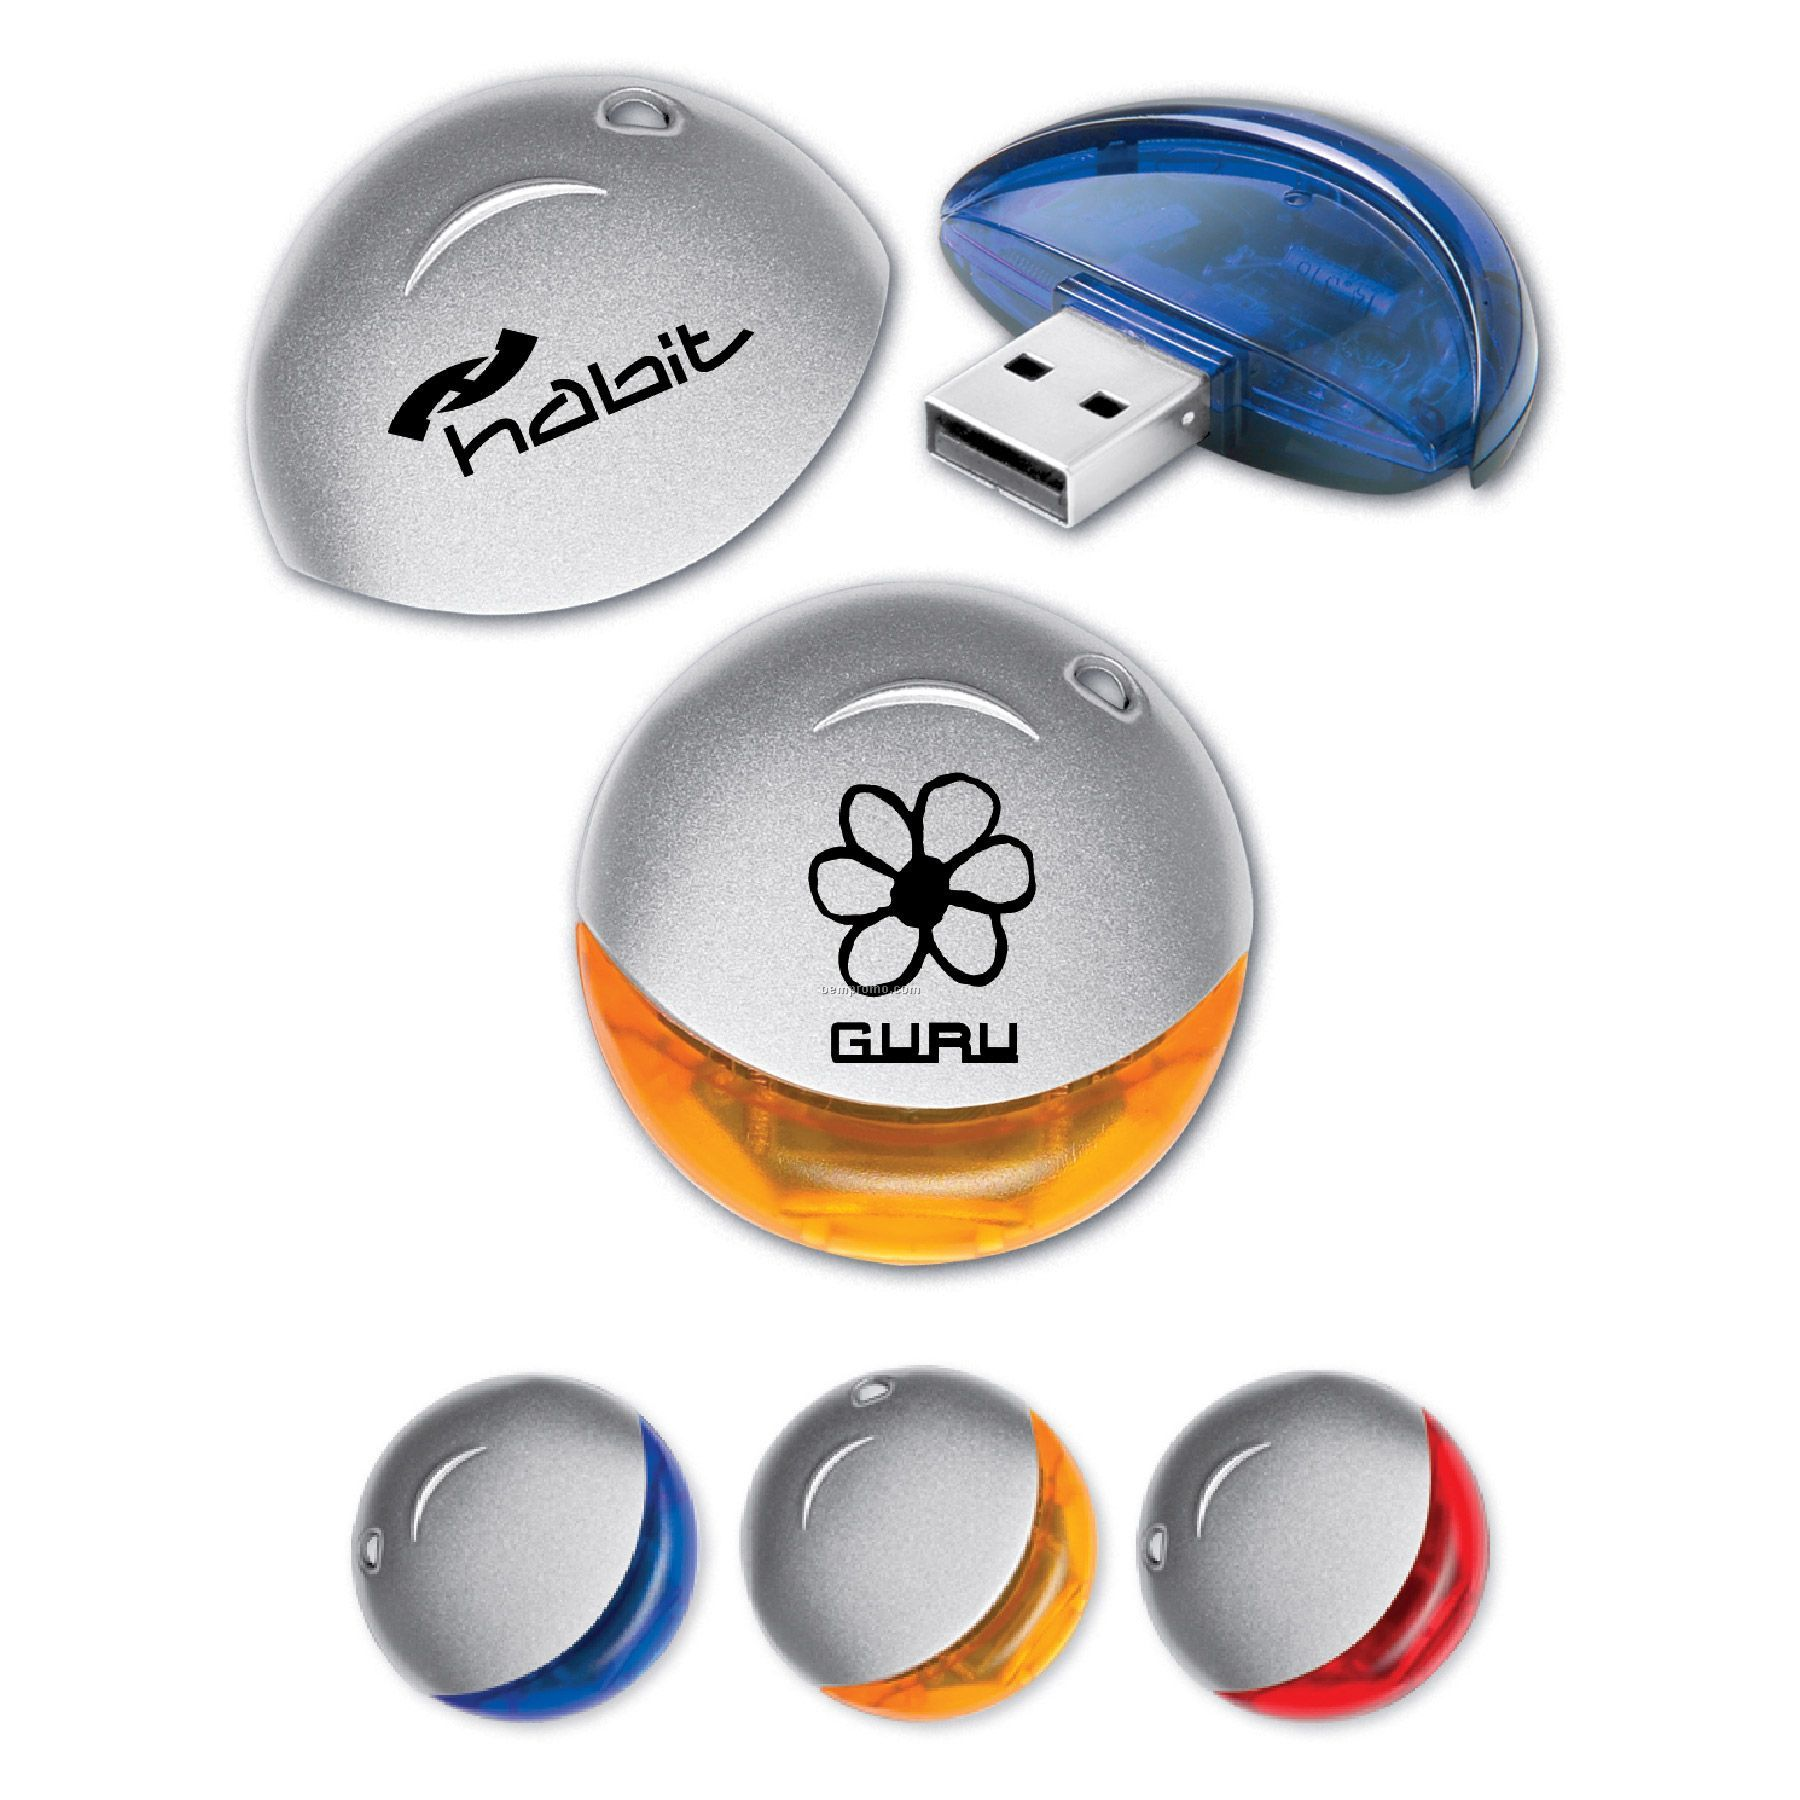 USB 2.0 Orbit Flash Drive Or